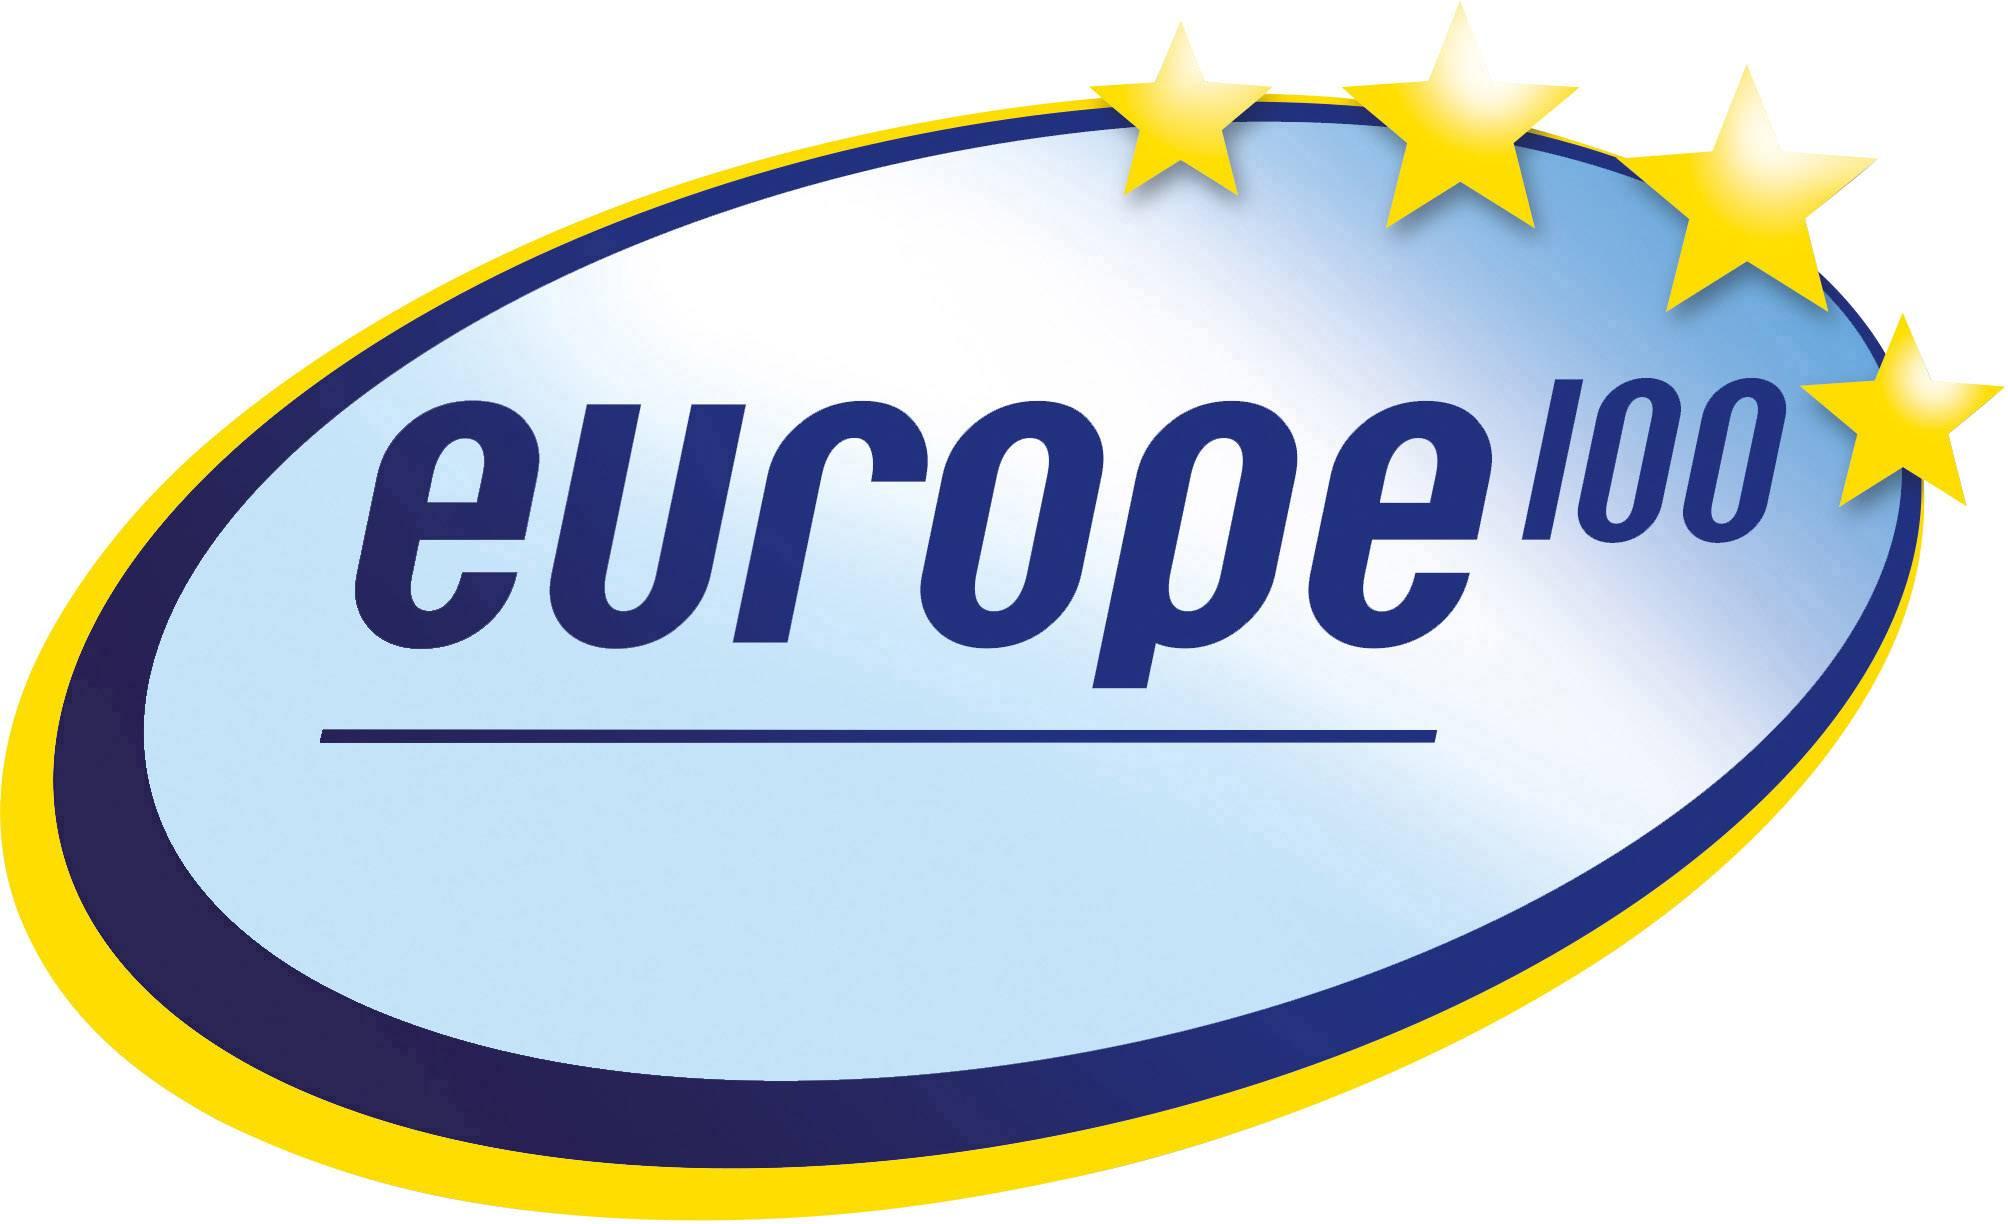 Europe 100